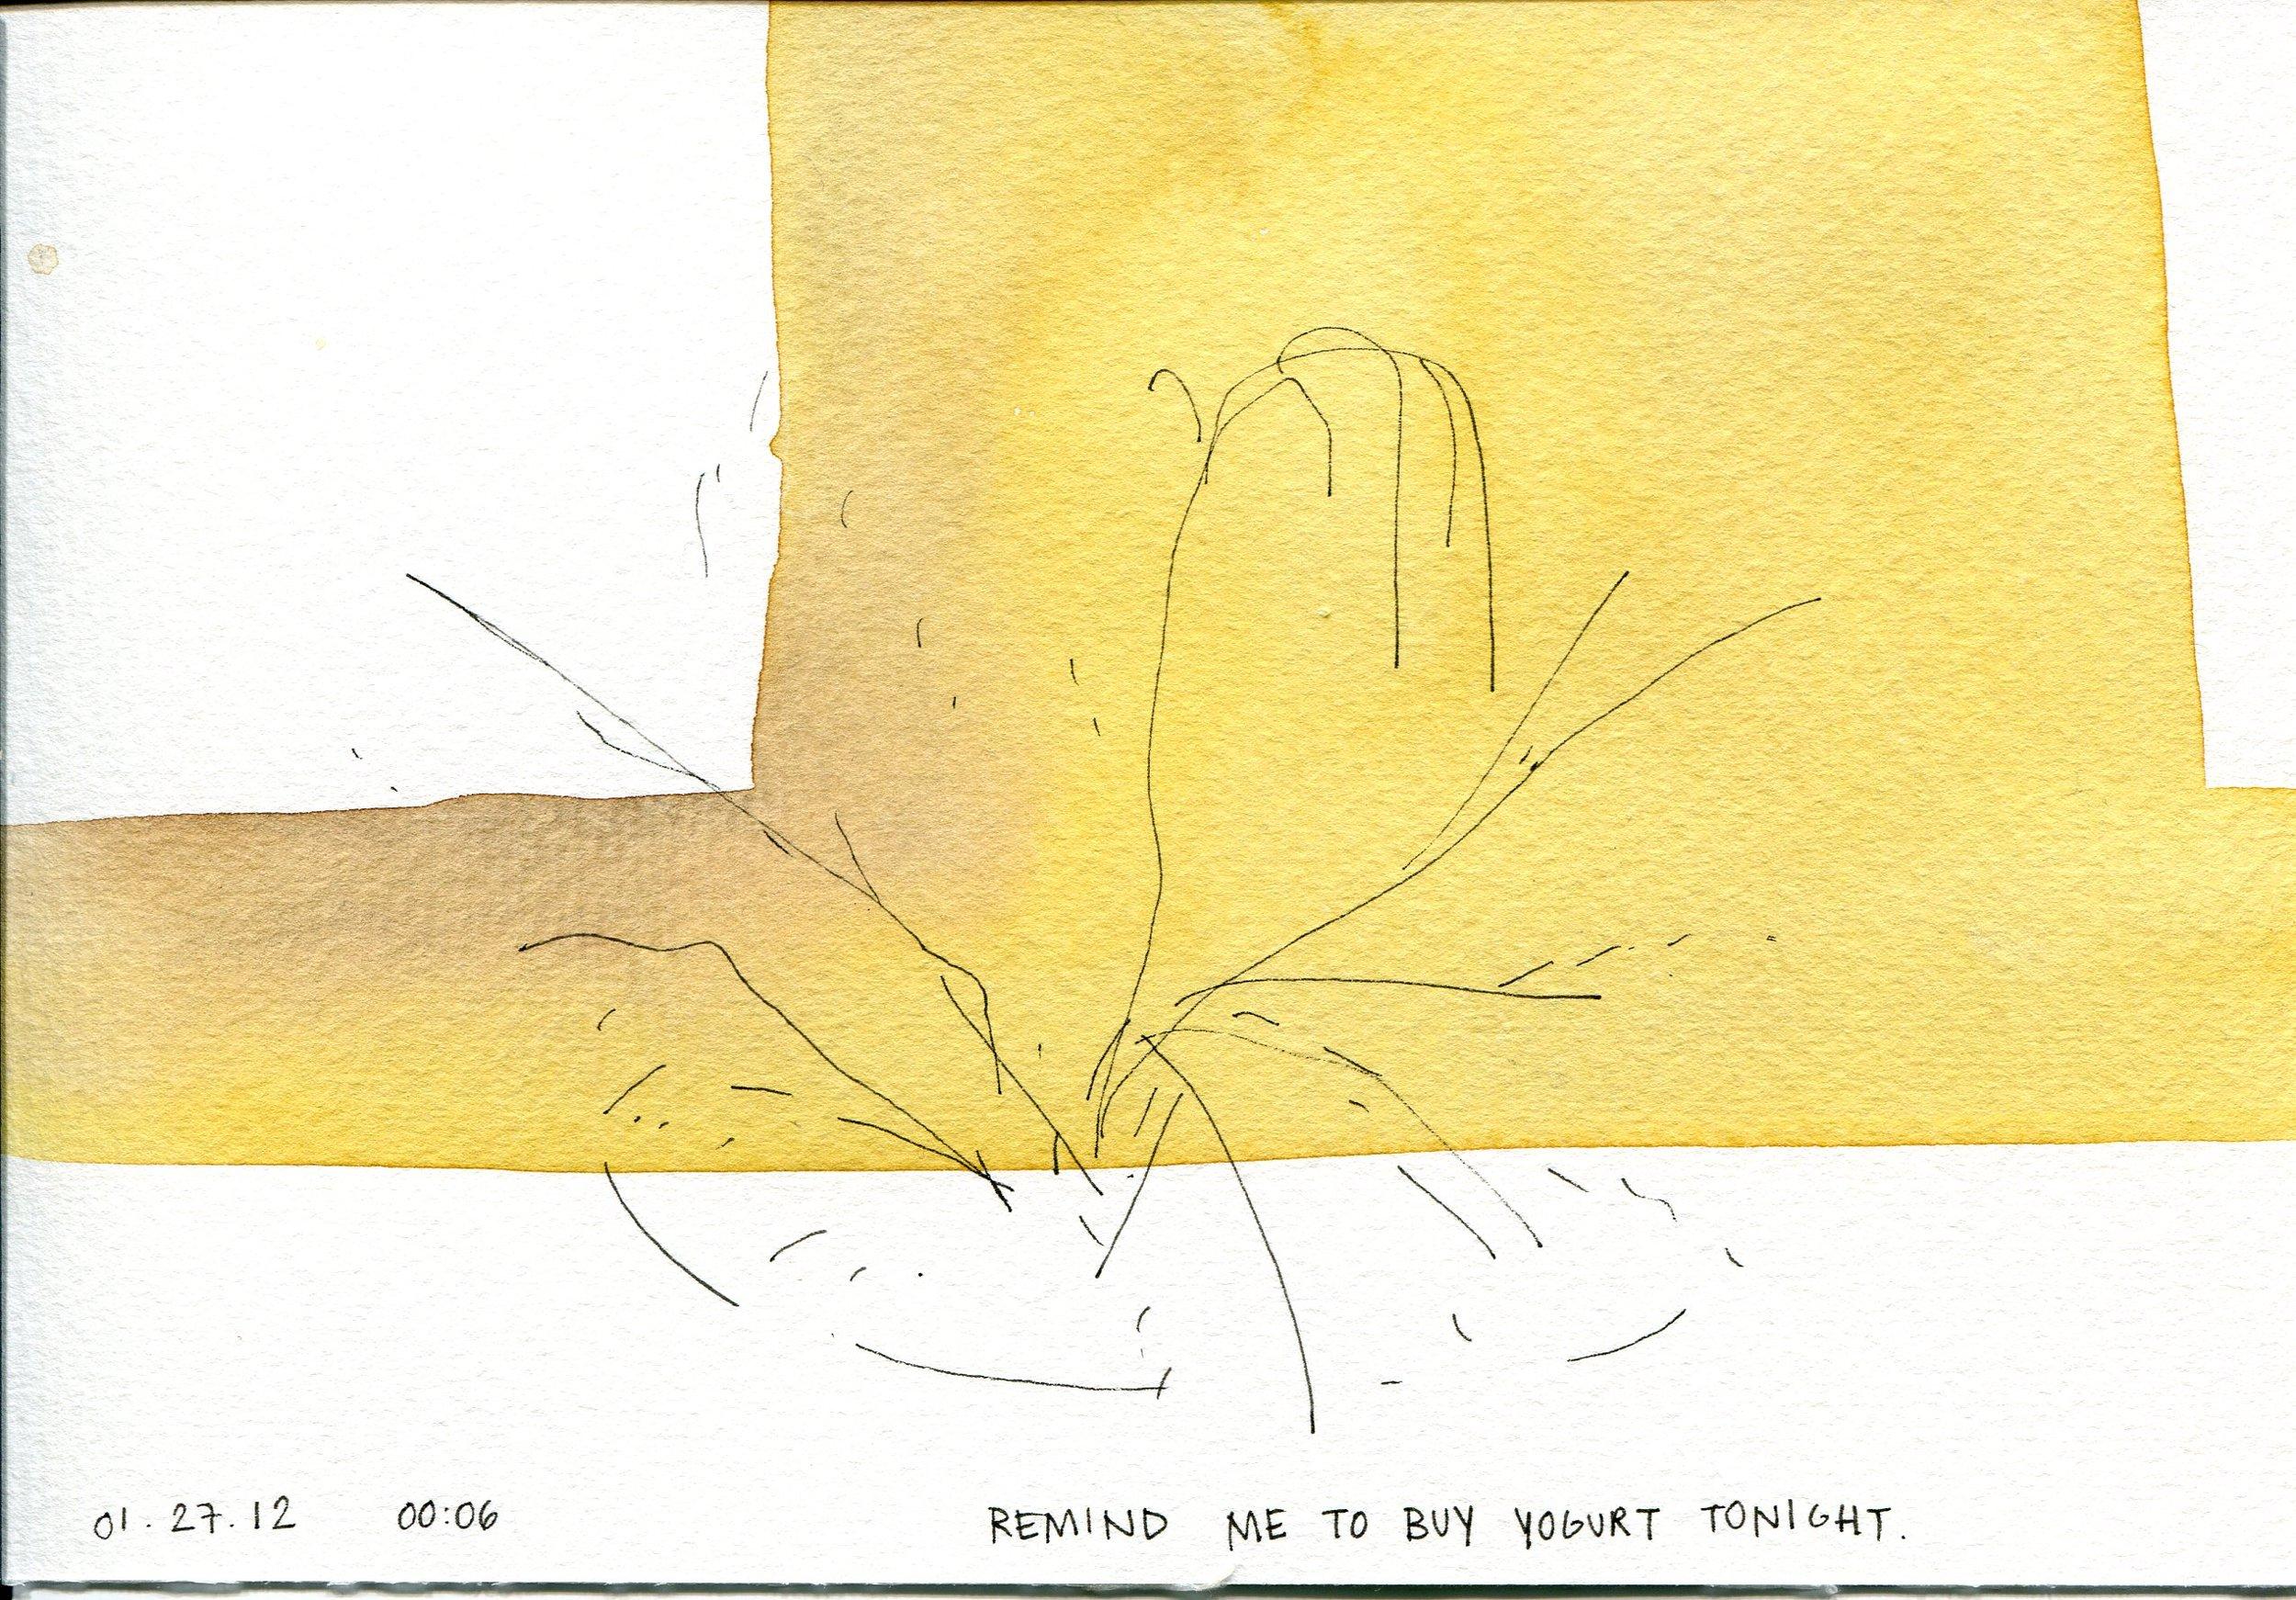 2012-01-28 drawing006.jpg